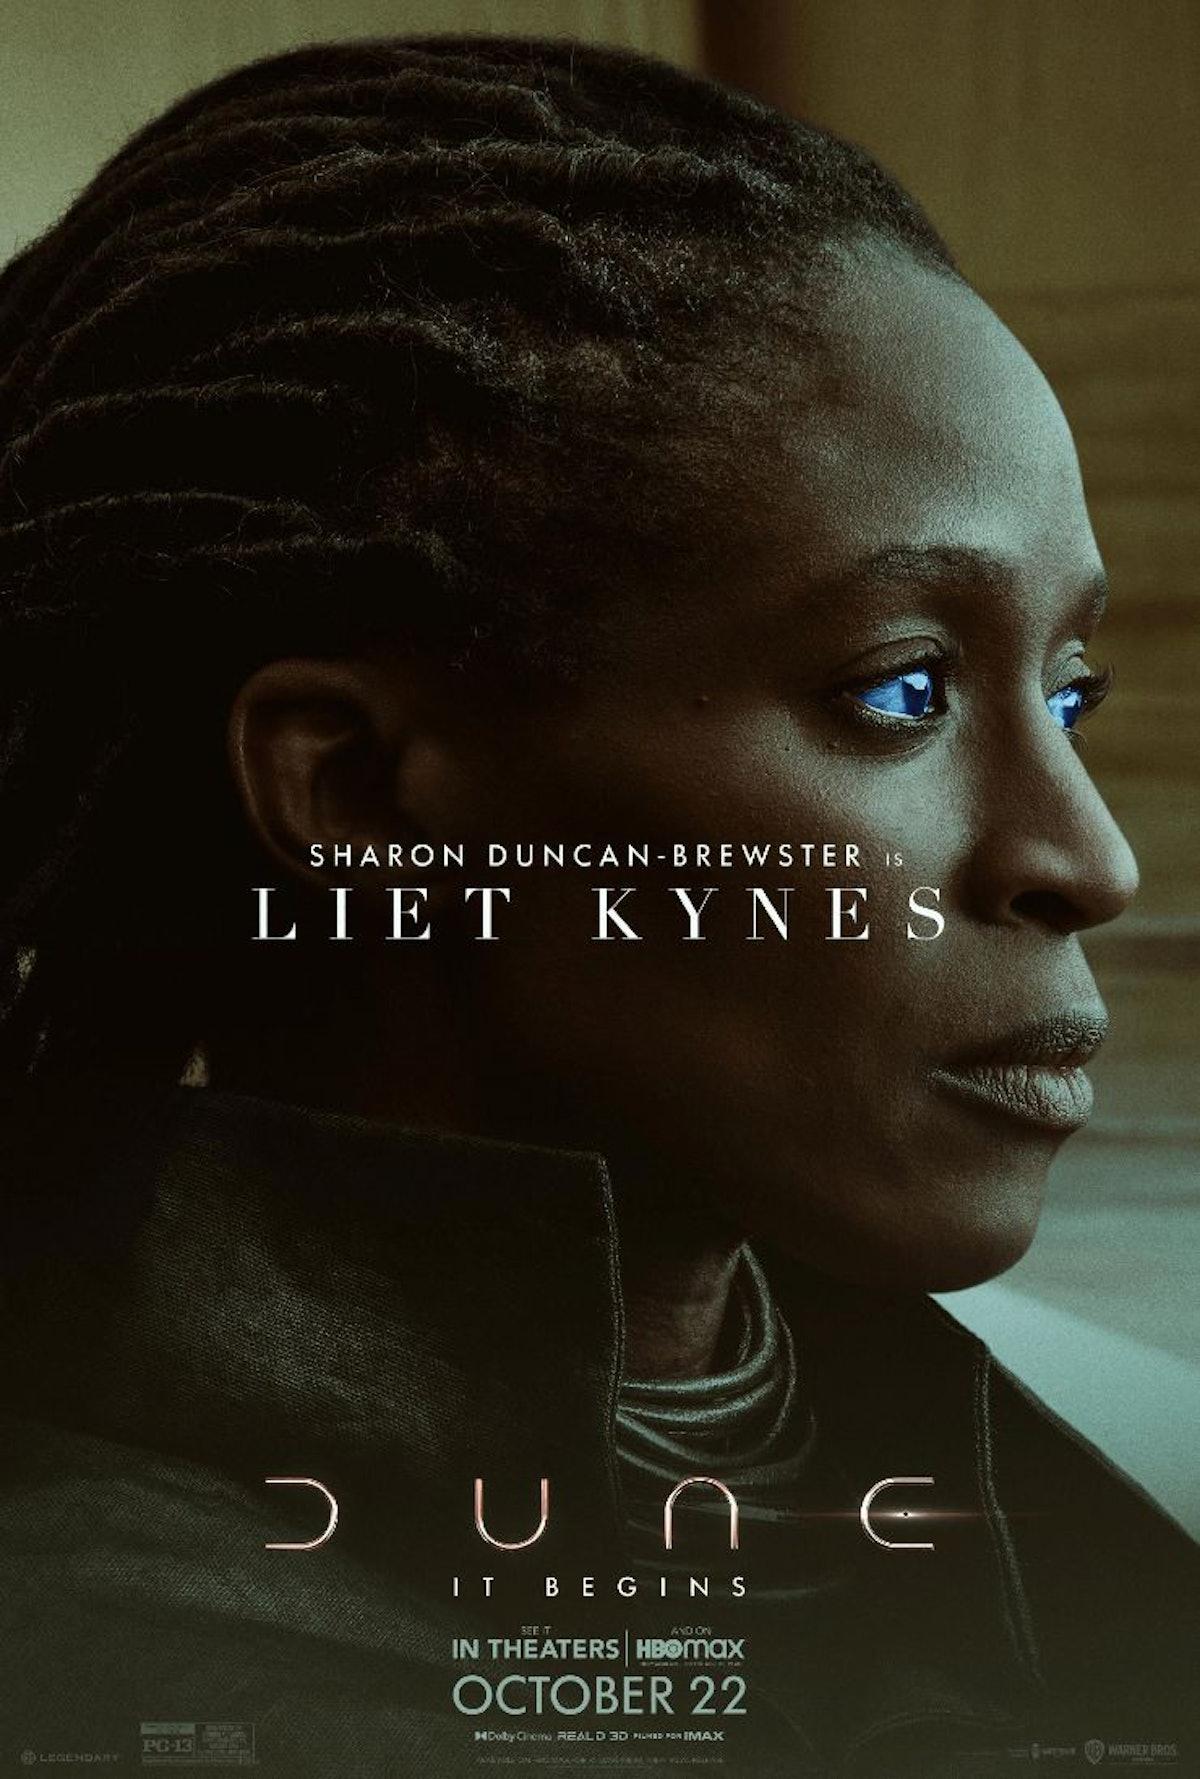 Sharon Duncan-Brewster as Dr. Liet-Kynes in 'Dune'